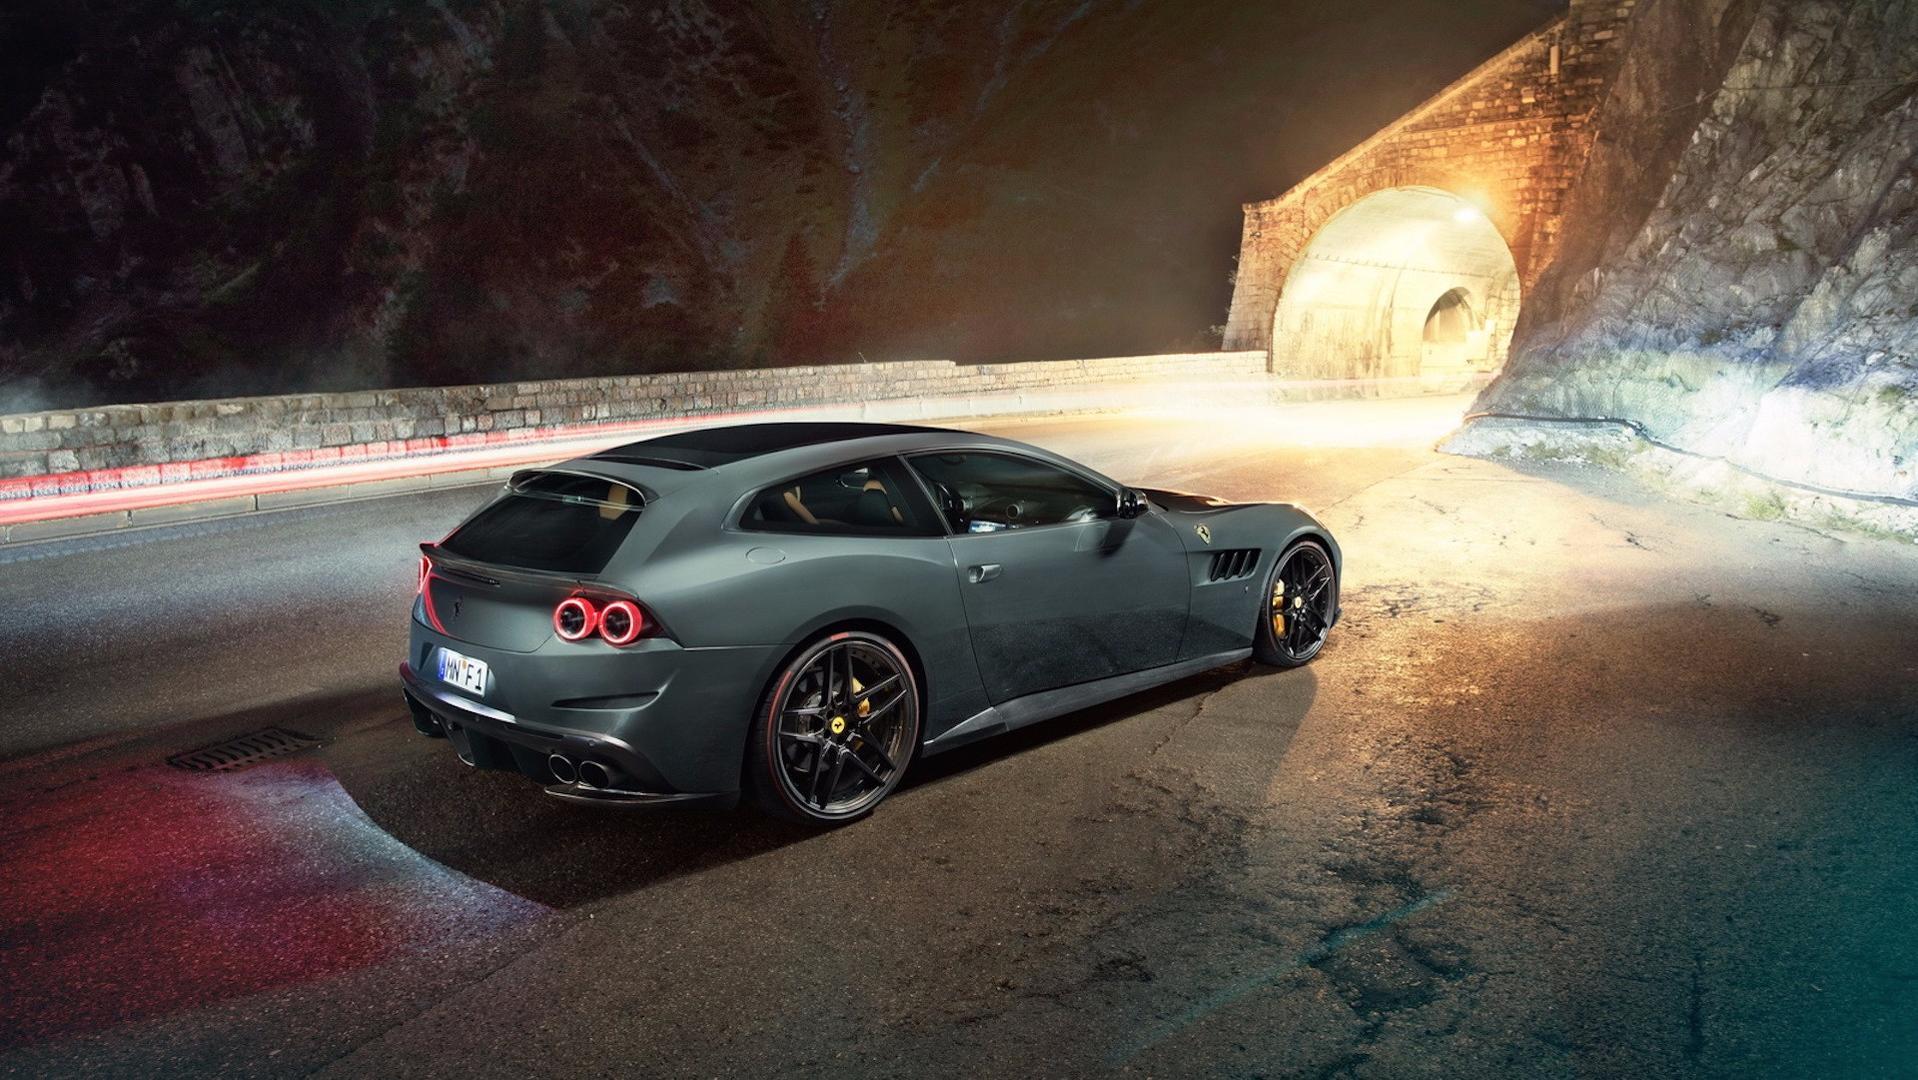 Ferrari GTC4Lusso by Novitec (12)